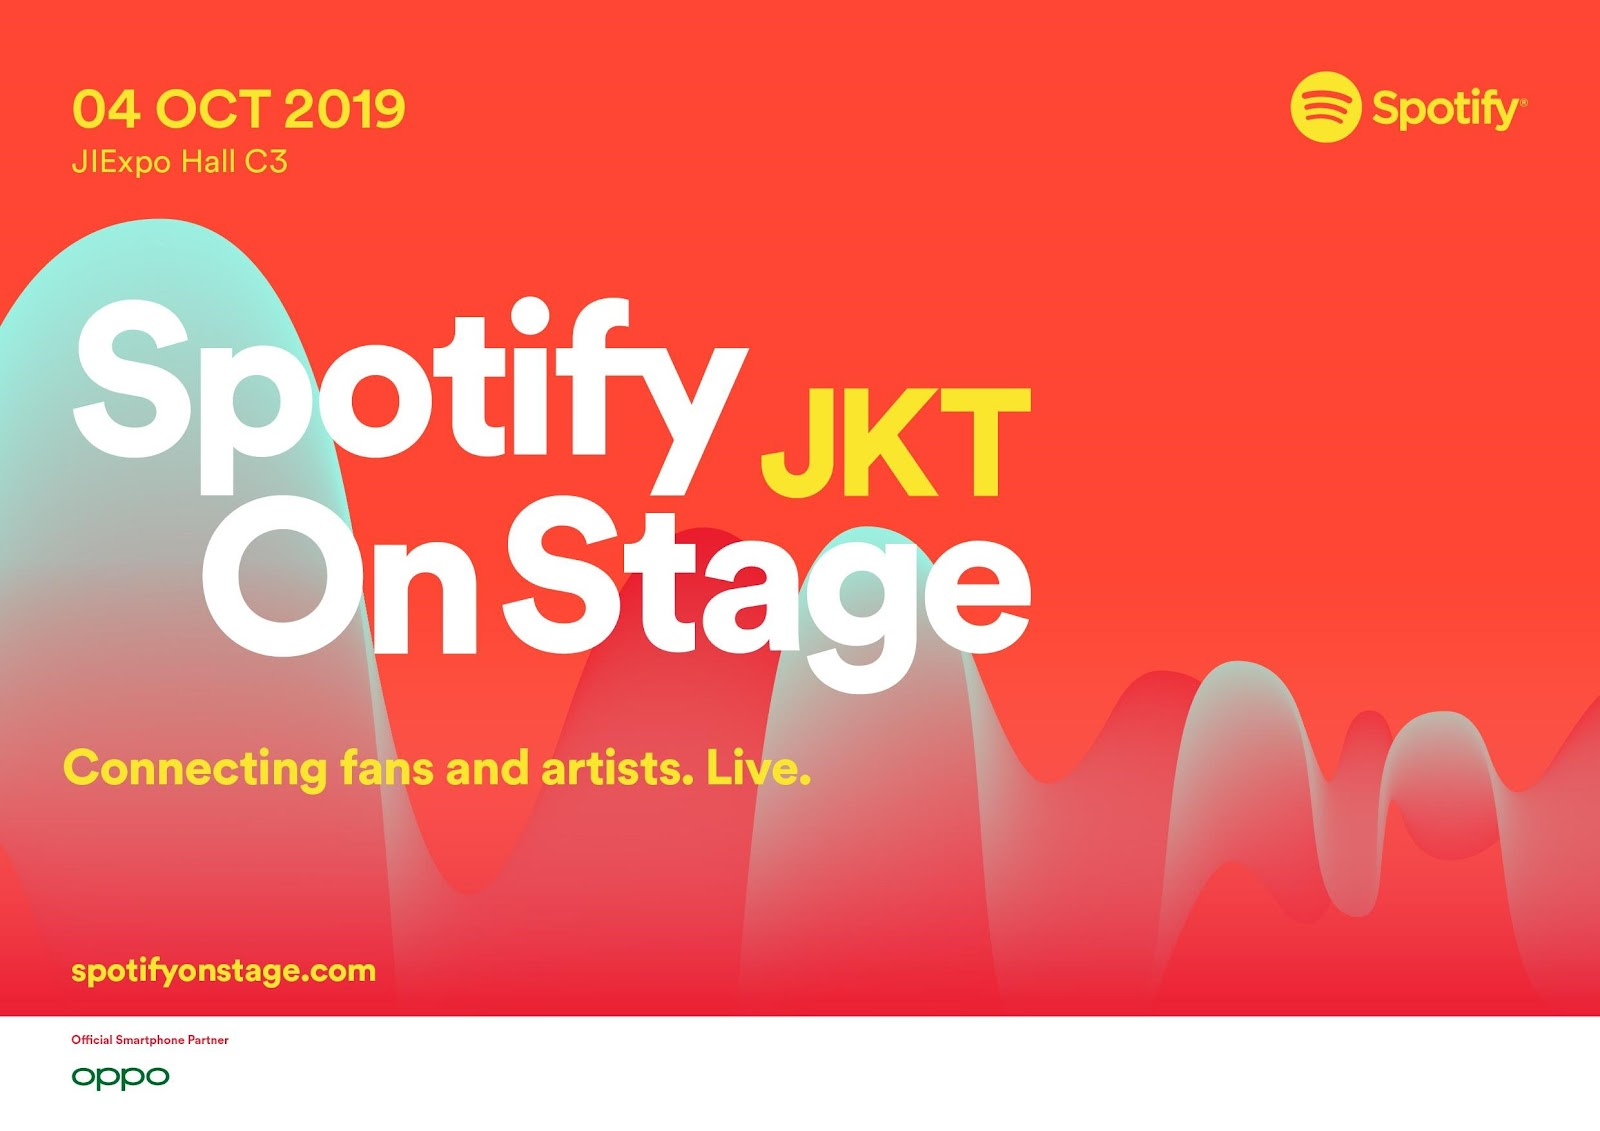 spotify-on-stage-hadir-lagi-dengan-line-up-artis-lebih-seru